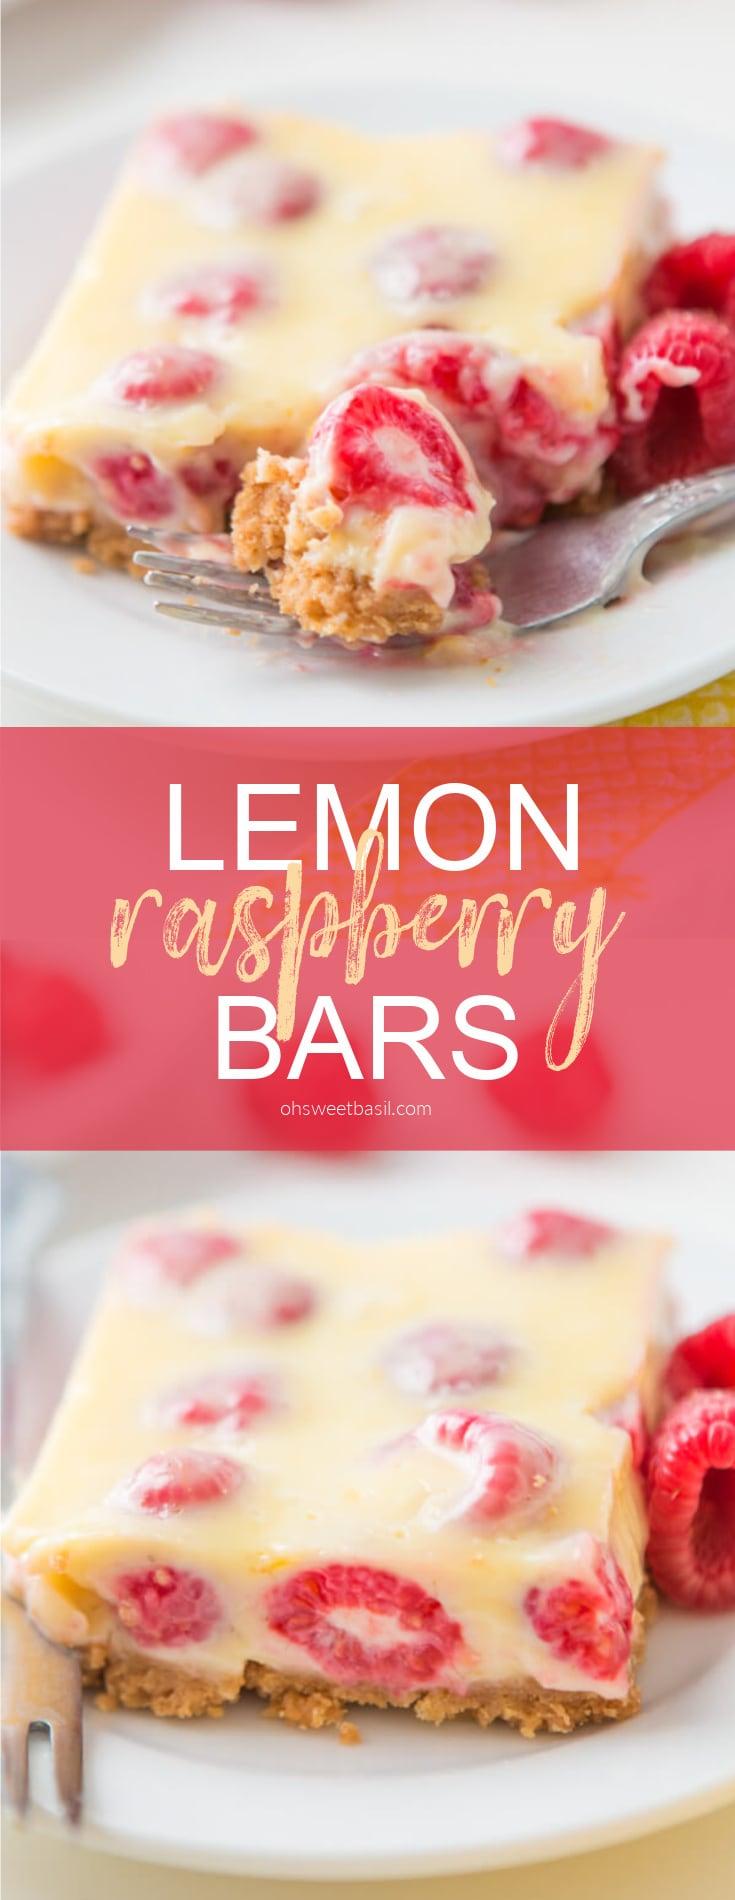 Lemon Raspberry Bars with a buttery graham cracker crust